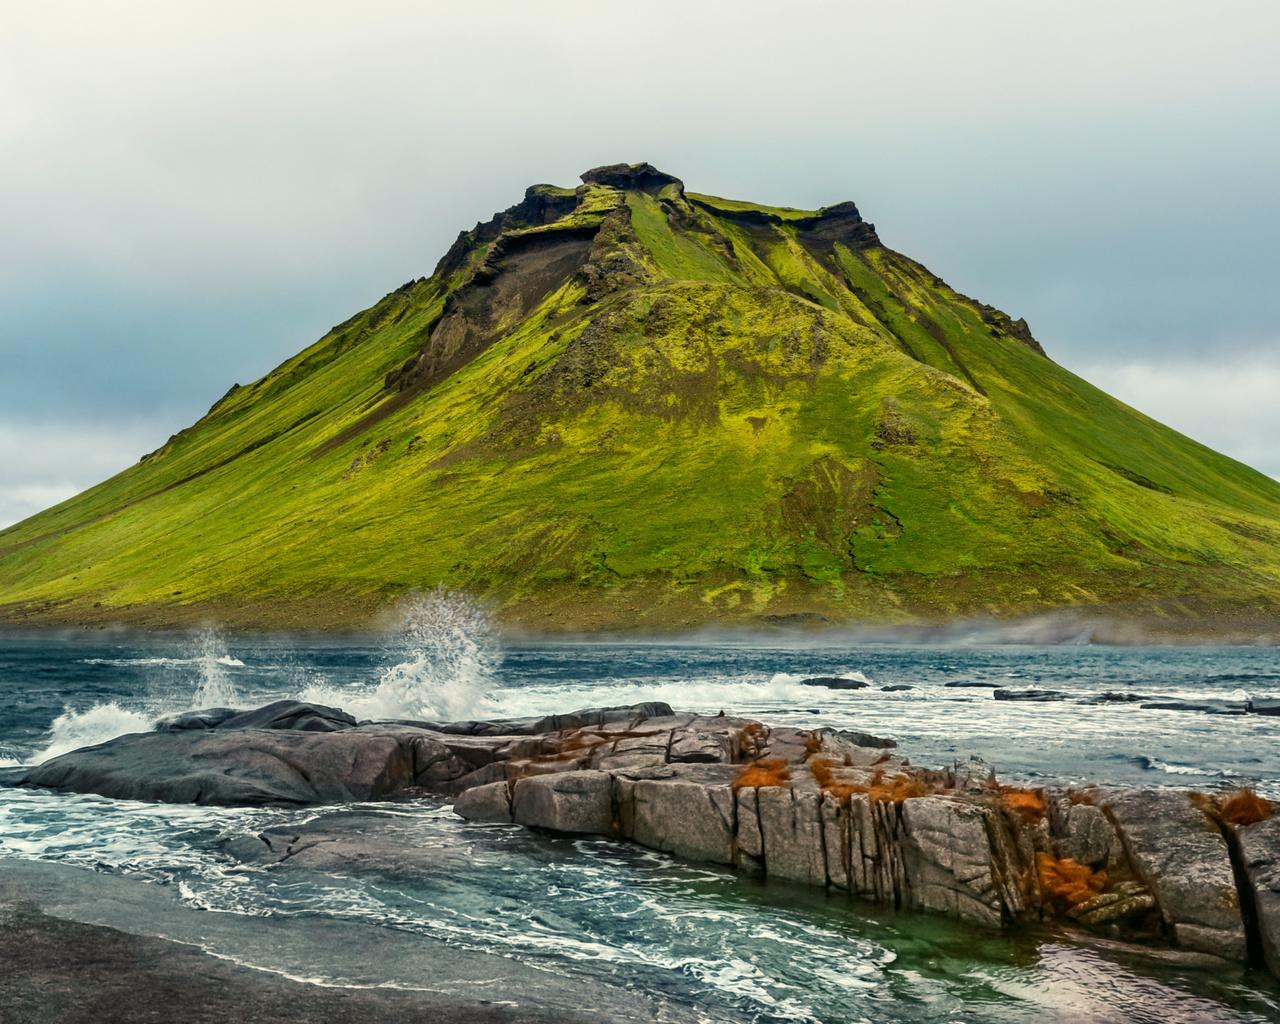 океан, гора, пейзаж